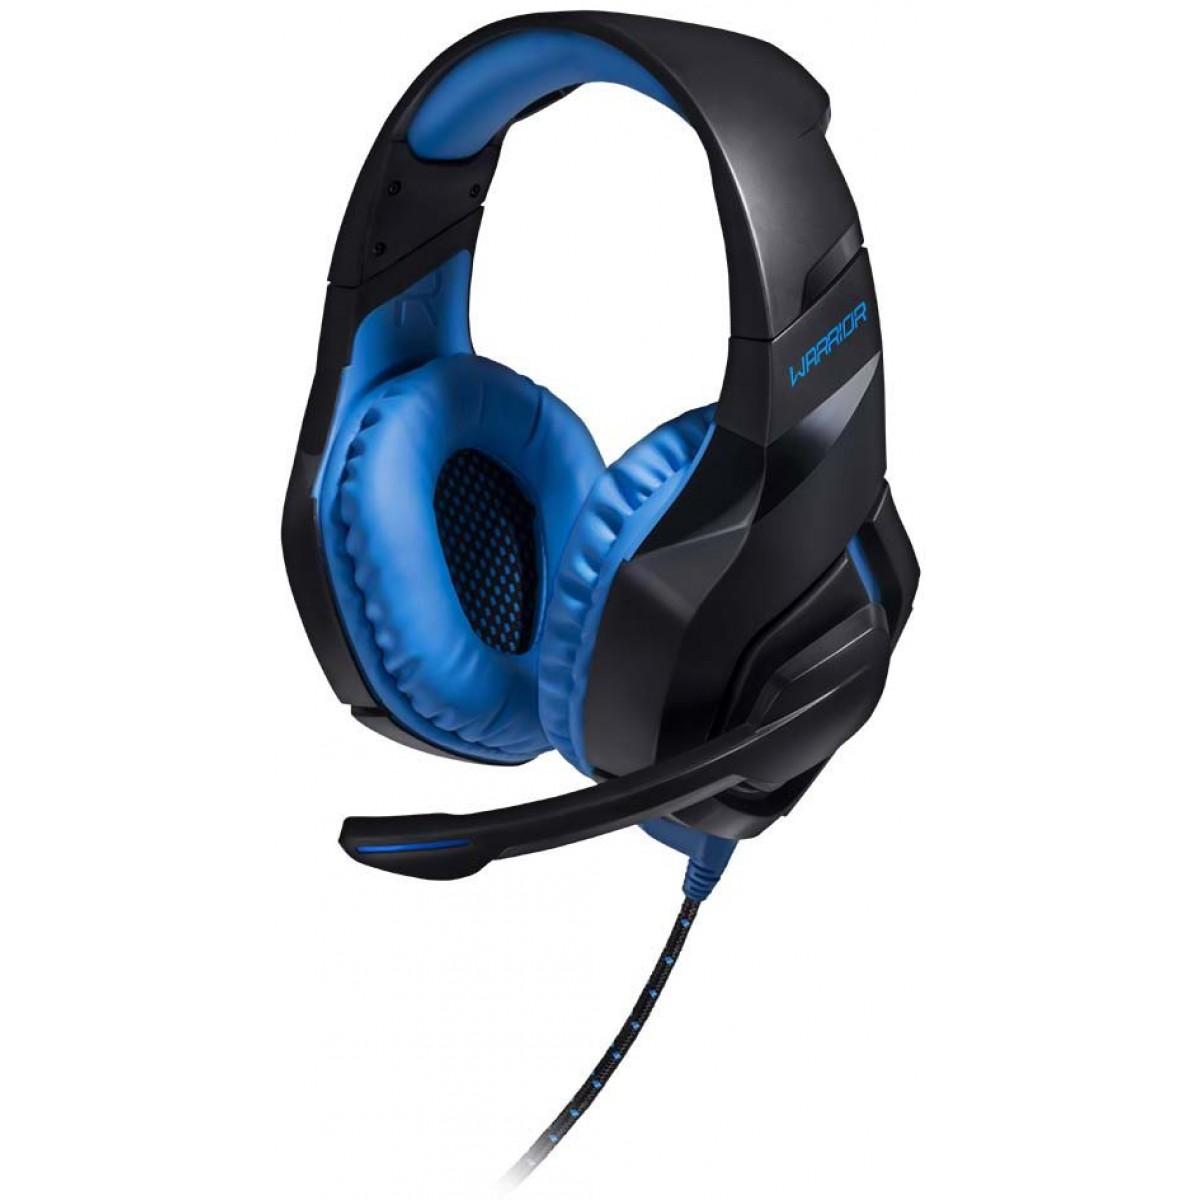 Headset Gamer Warrior Straton Led Azul, Stereo, USB, Preto/Azul, PH244